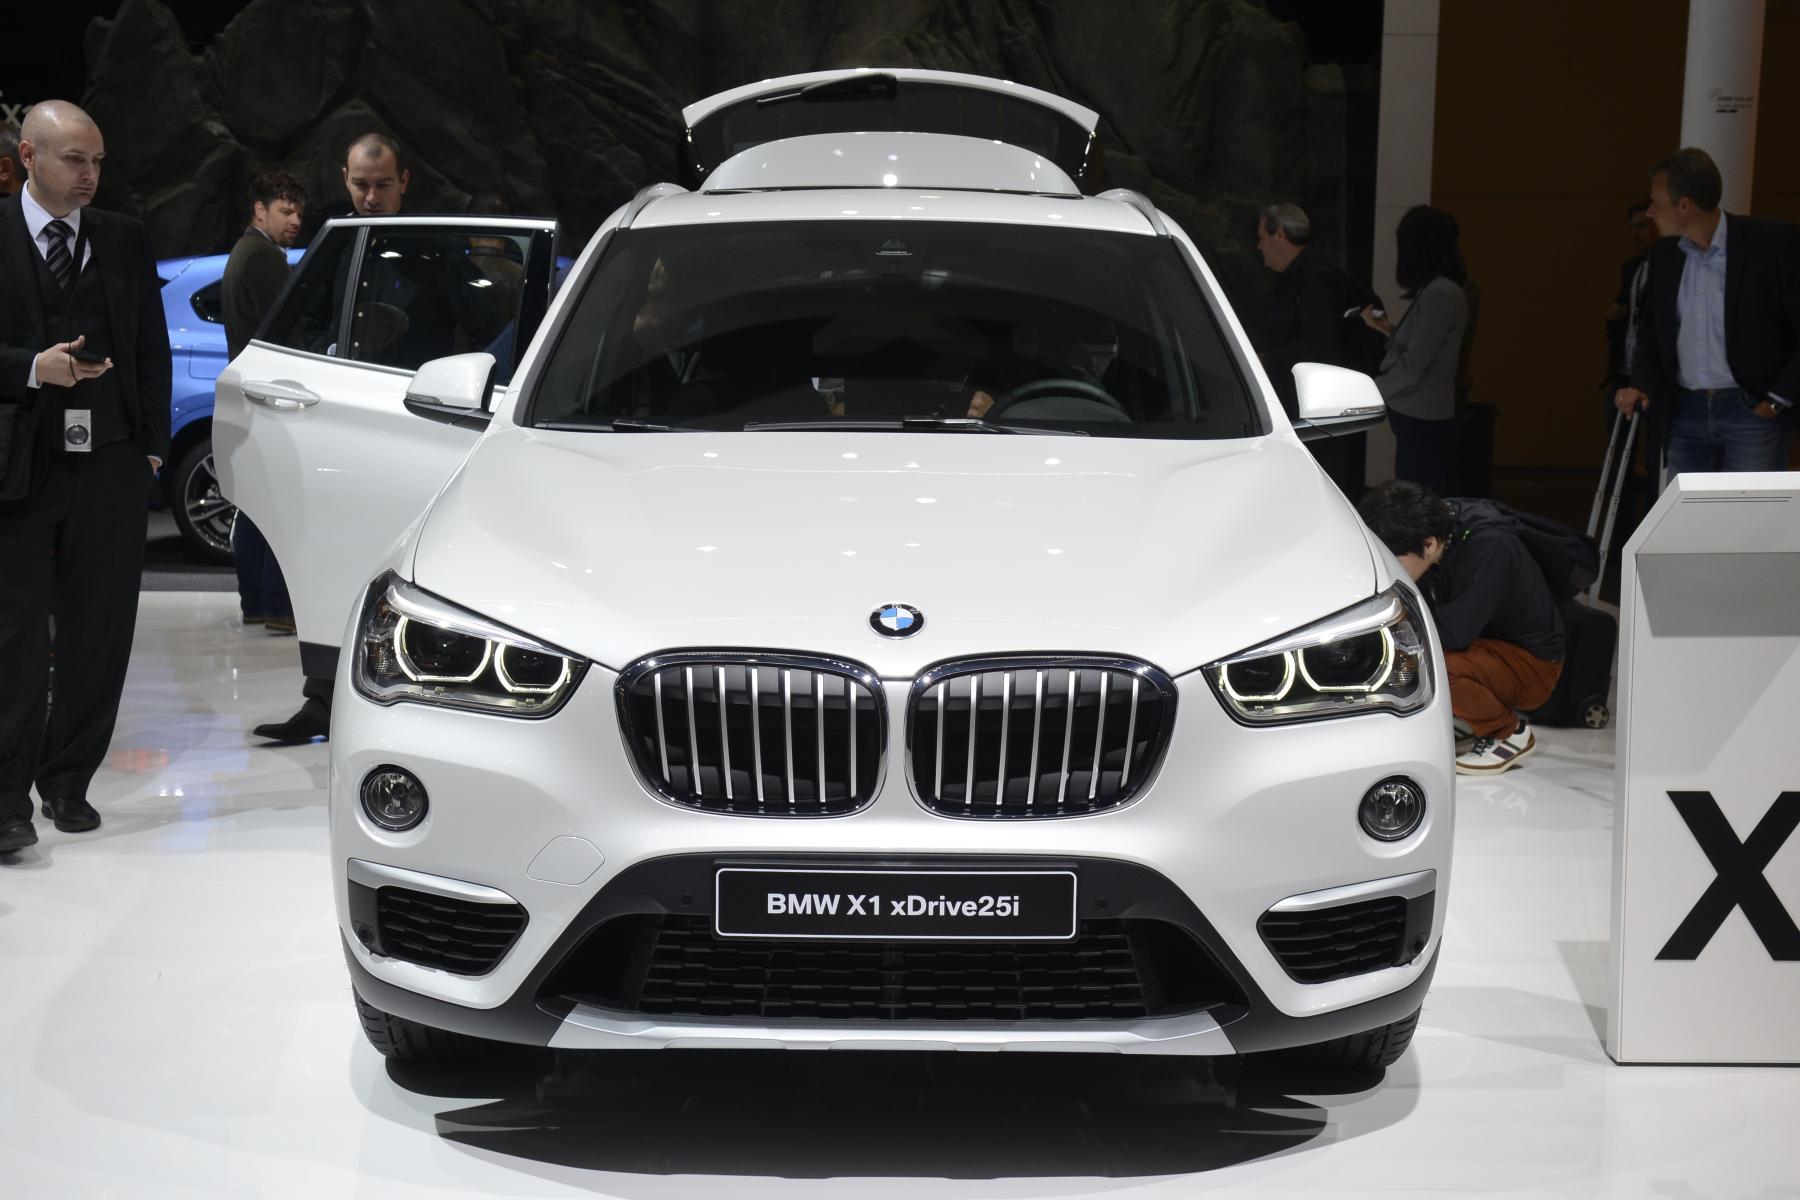 BMW X1 xDrive25i (front)